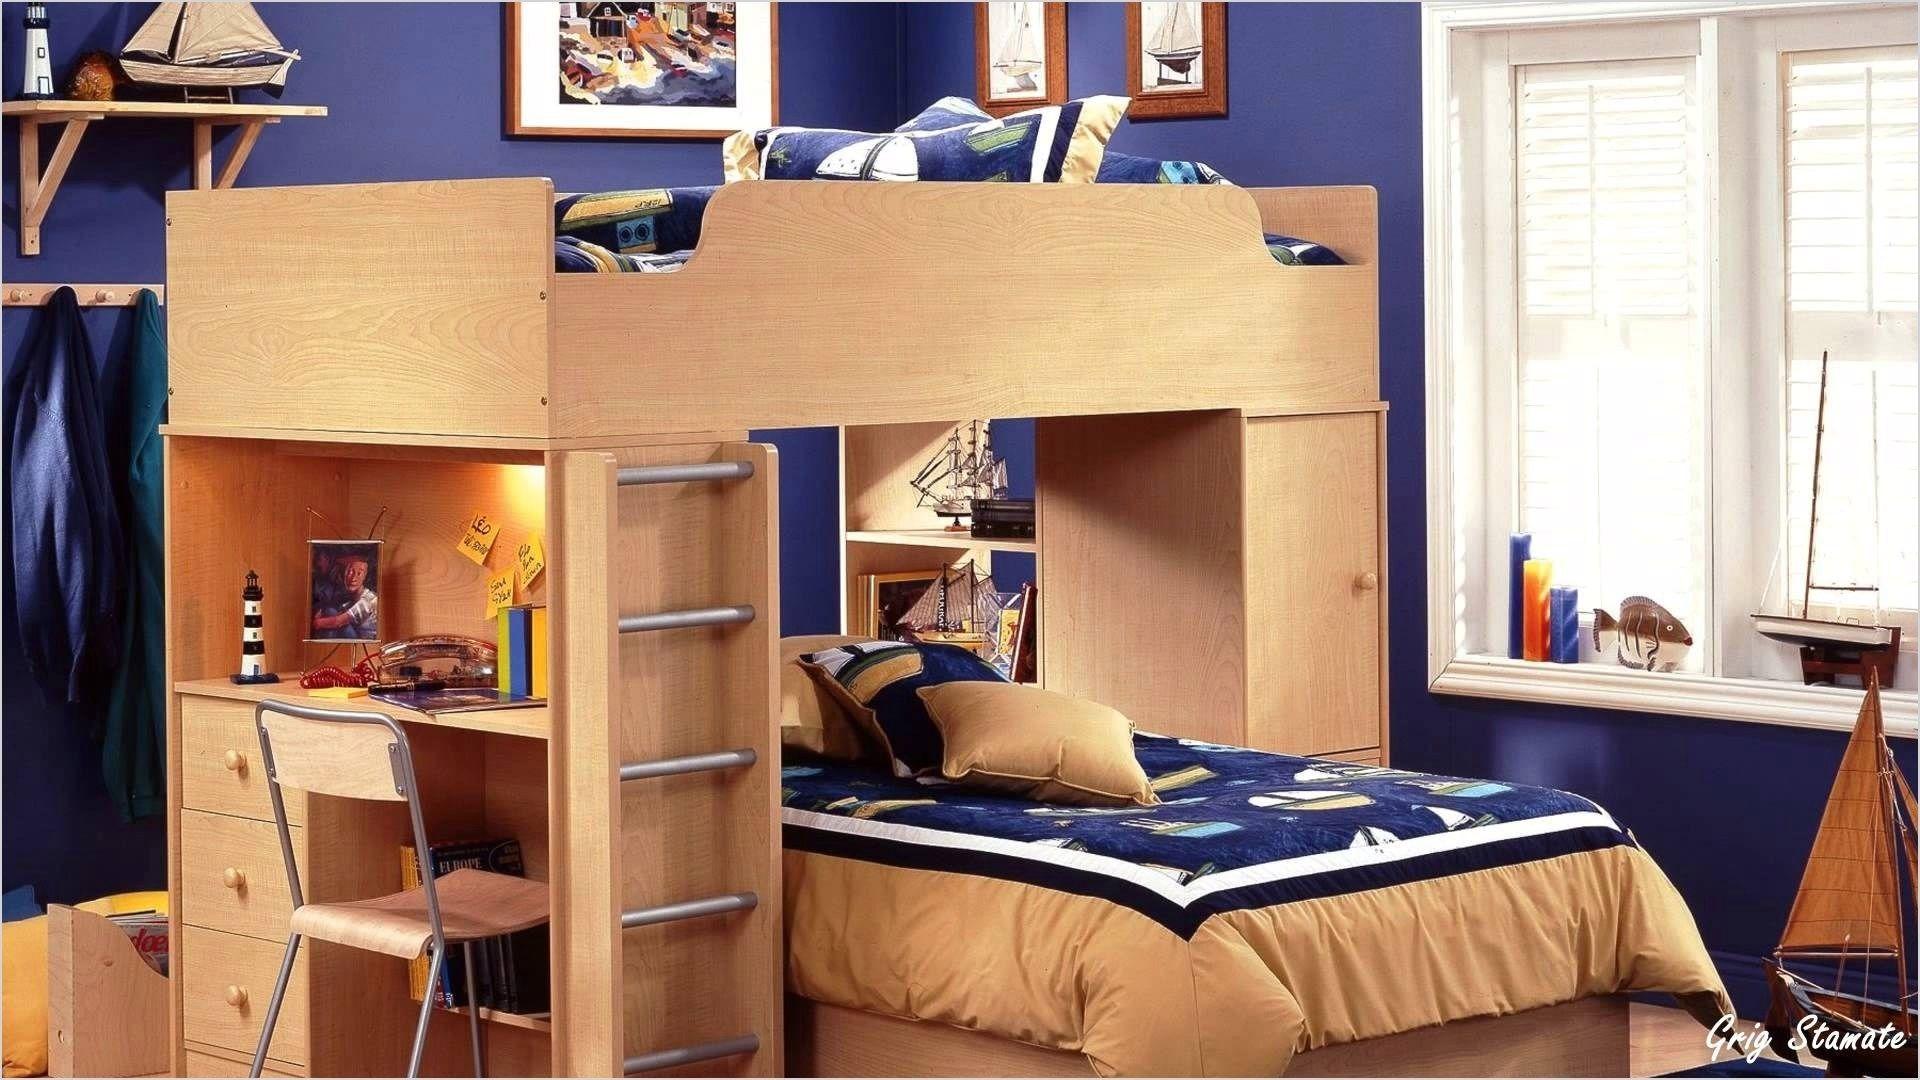 44 Inspiring Small Bedroom Space Savers 73 Bedroom Space Savers